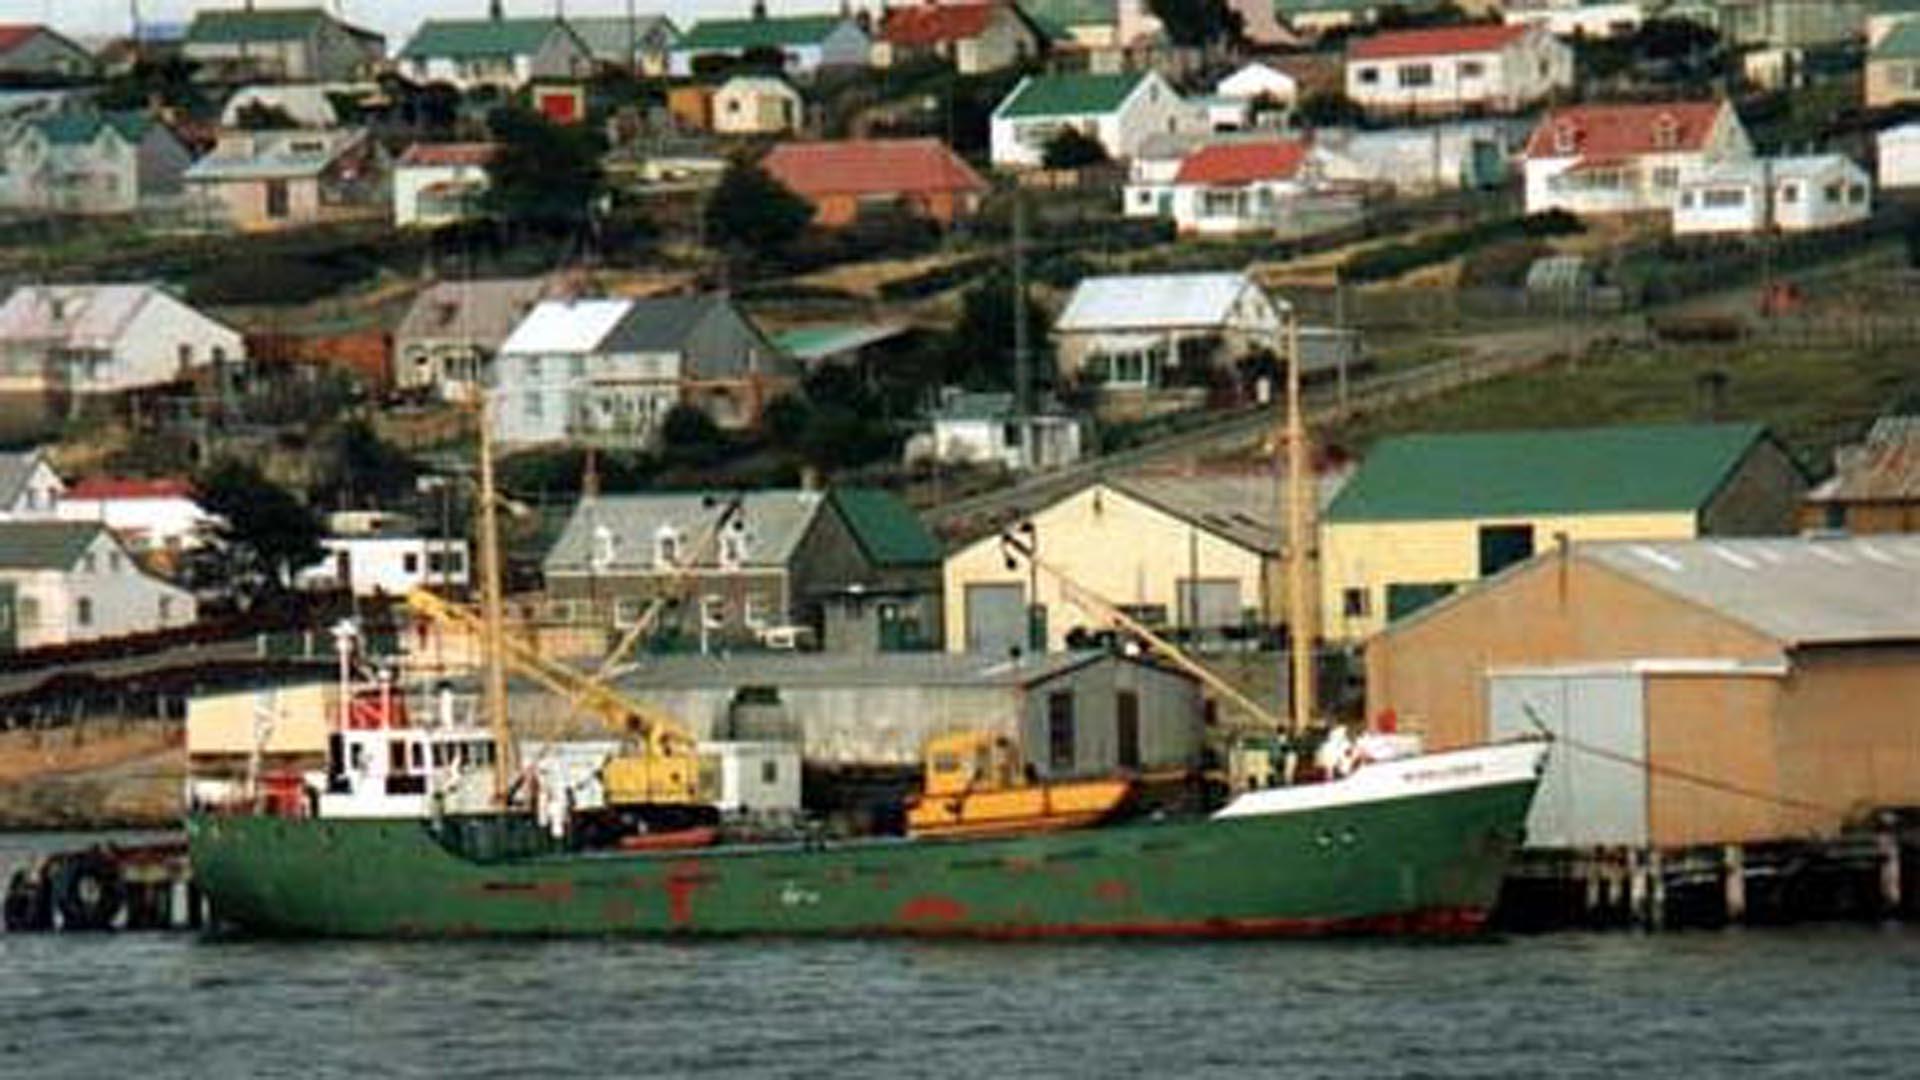 Monsunen en Malvinas